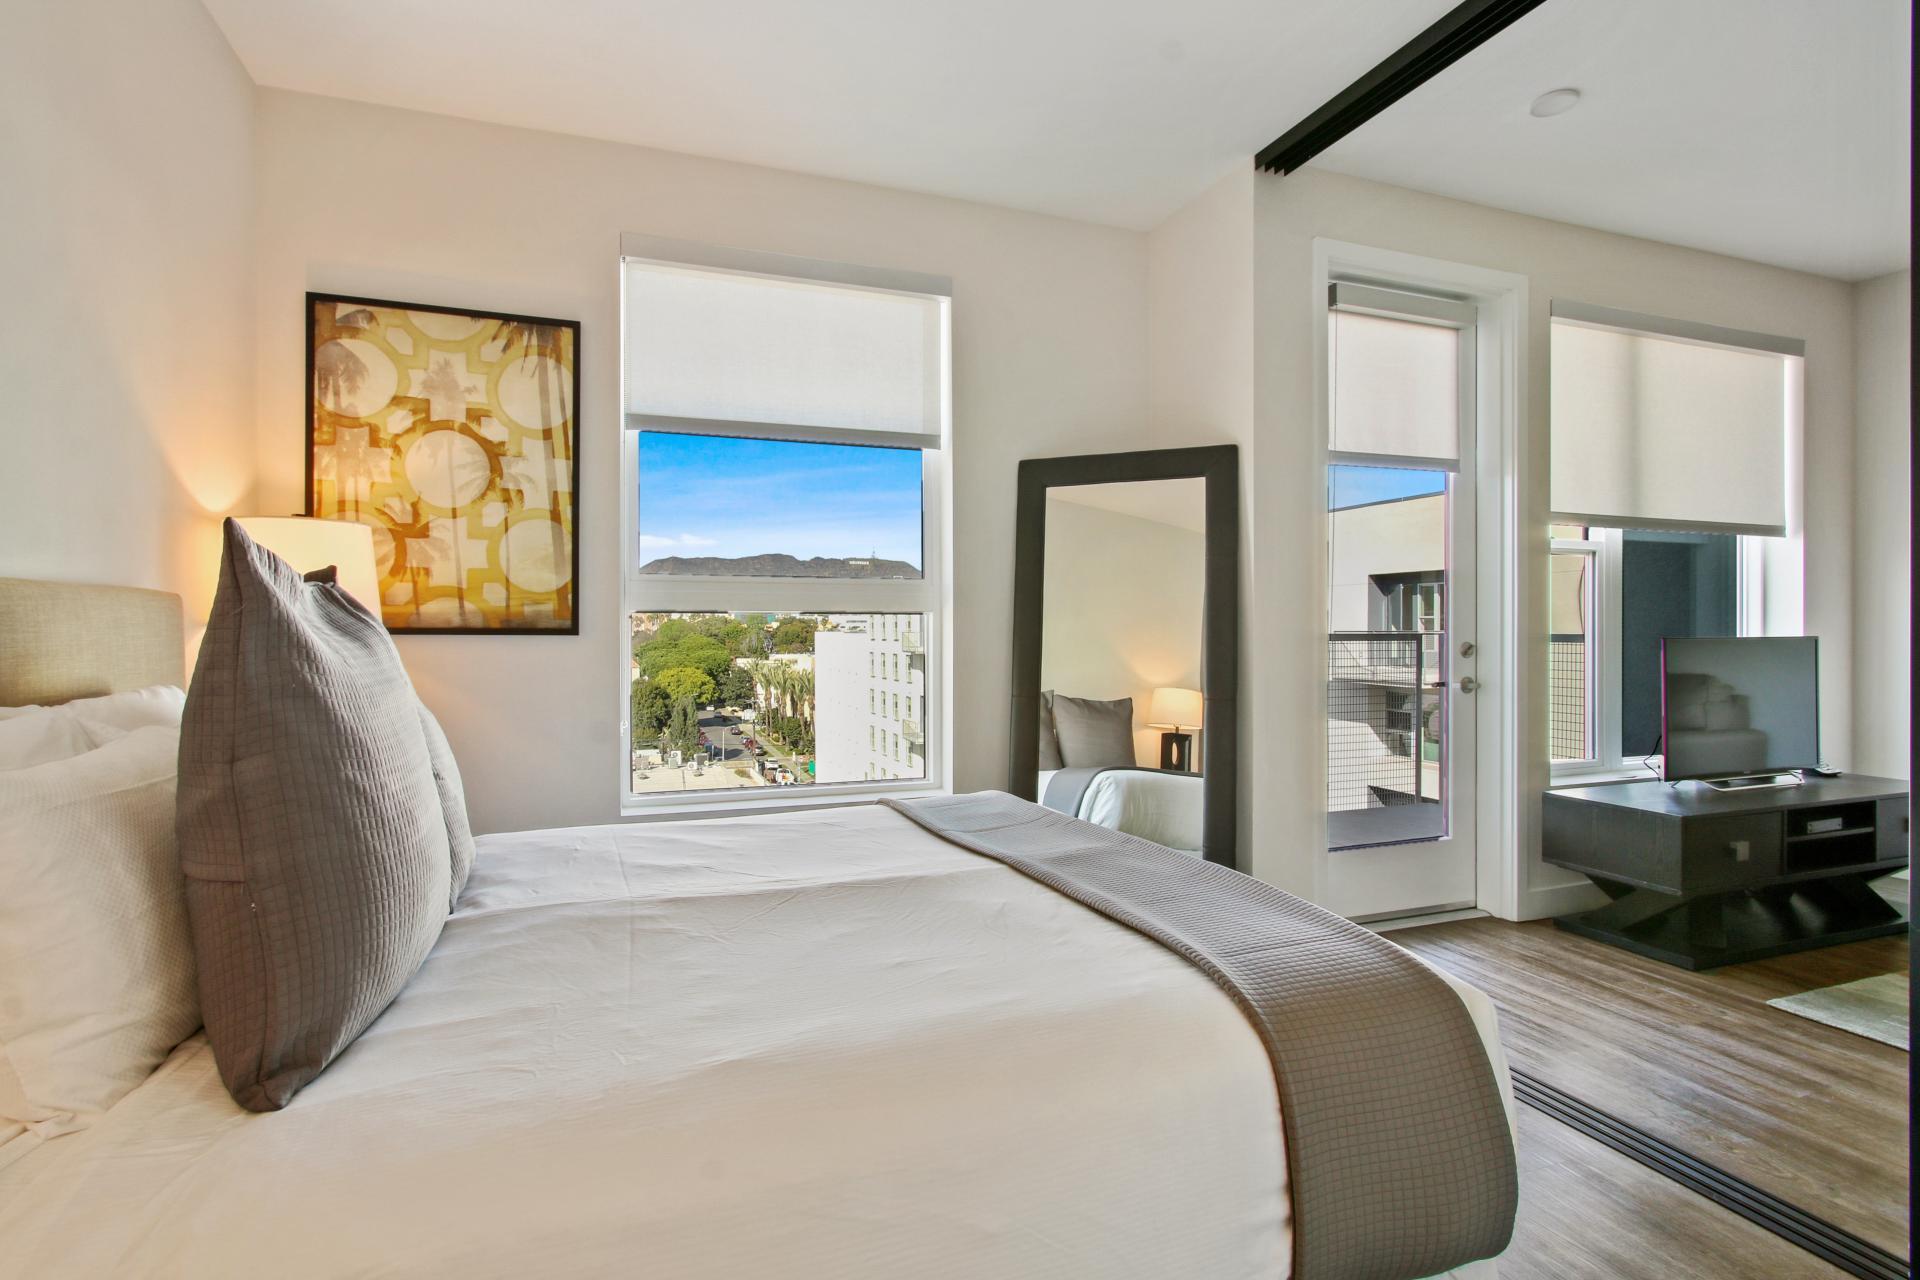 Ava Hollywood Apartments, Los Angeles, SilverDoor Apartments